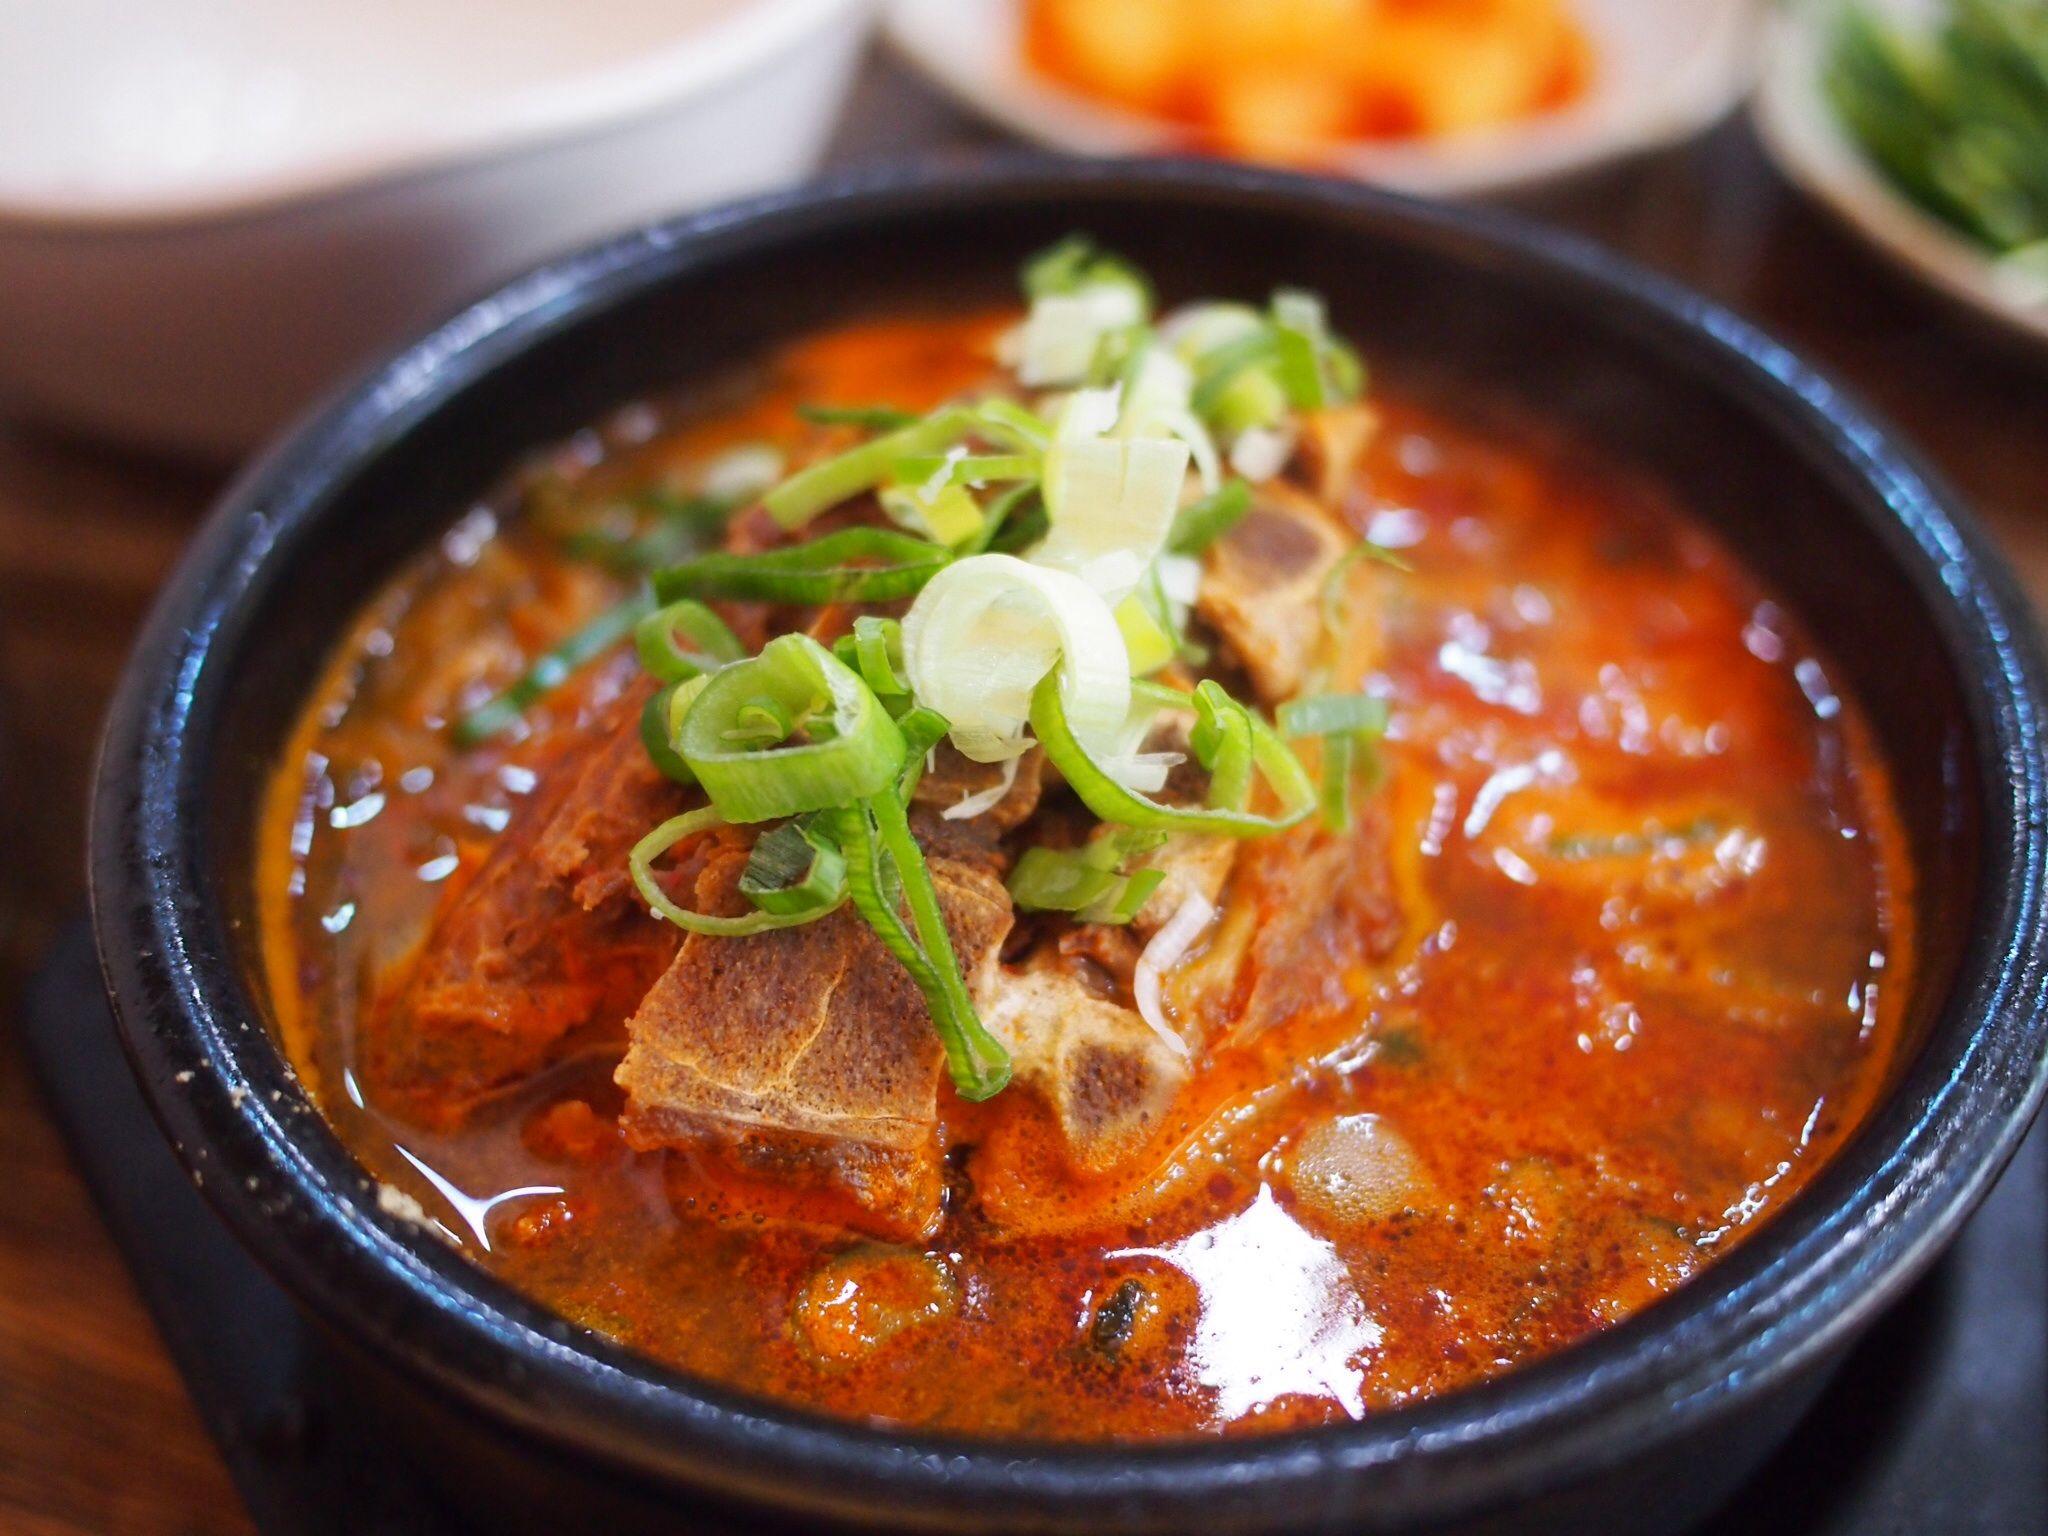 Haejangguk (hangover soup) | Food, Recipes, Hangover soup